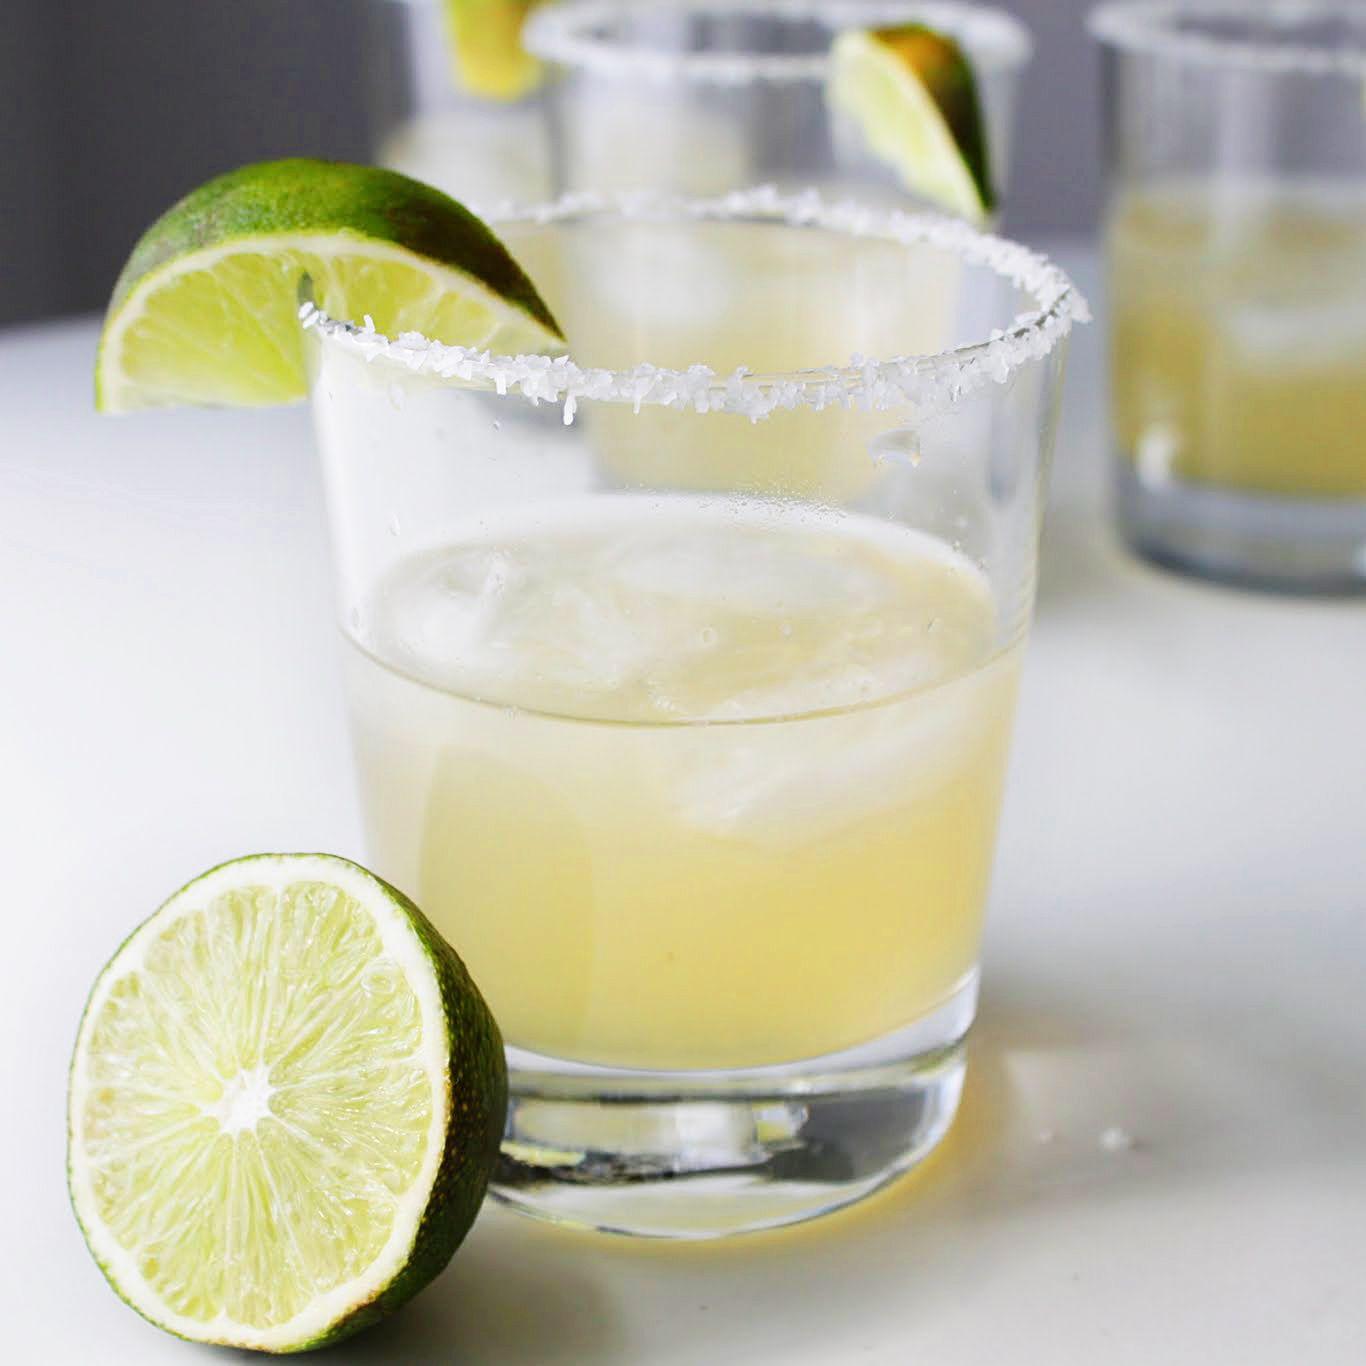 Chili's Margarita DIY: 1 Part Tequila, 1 Part Agave Nectar